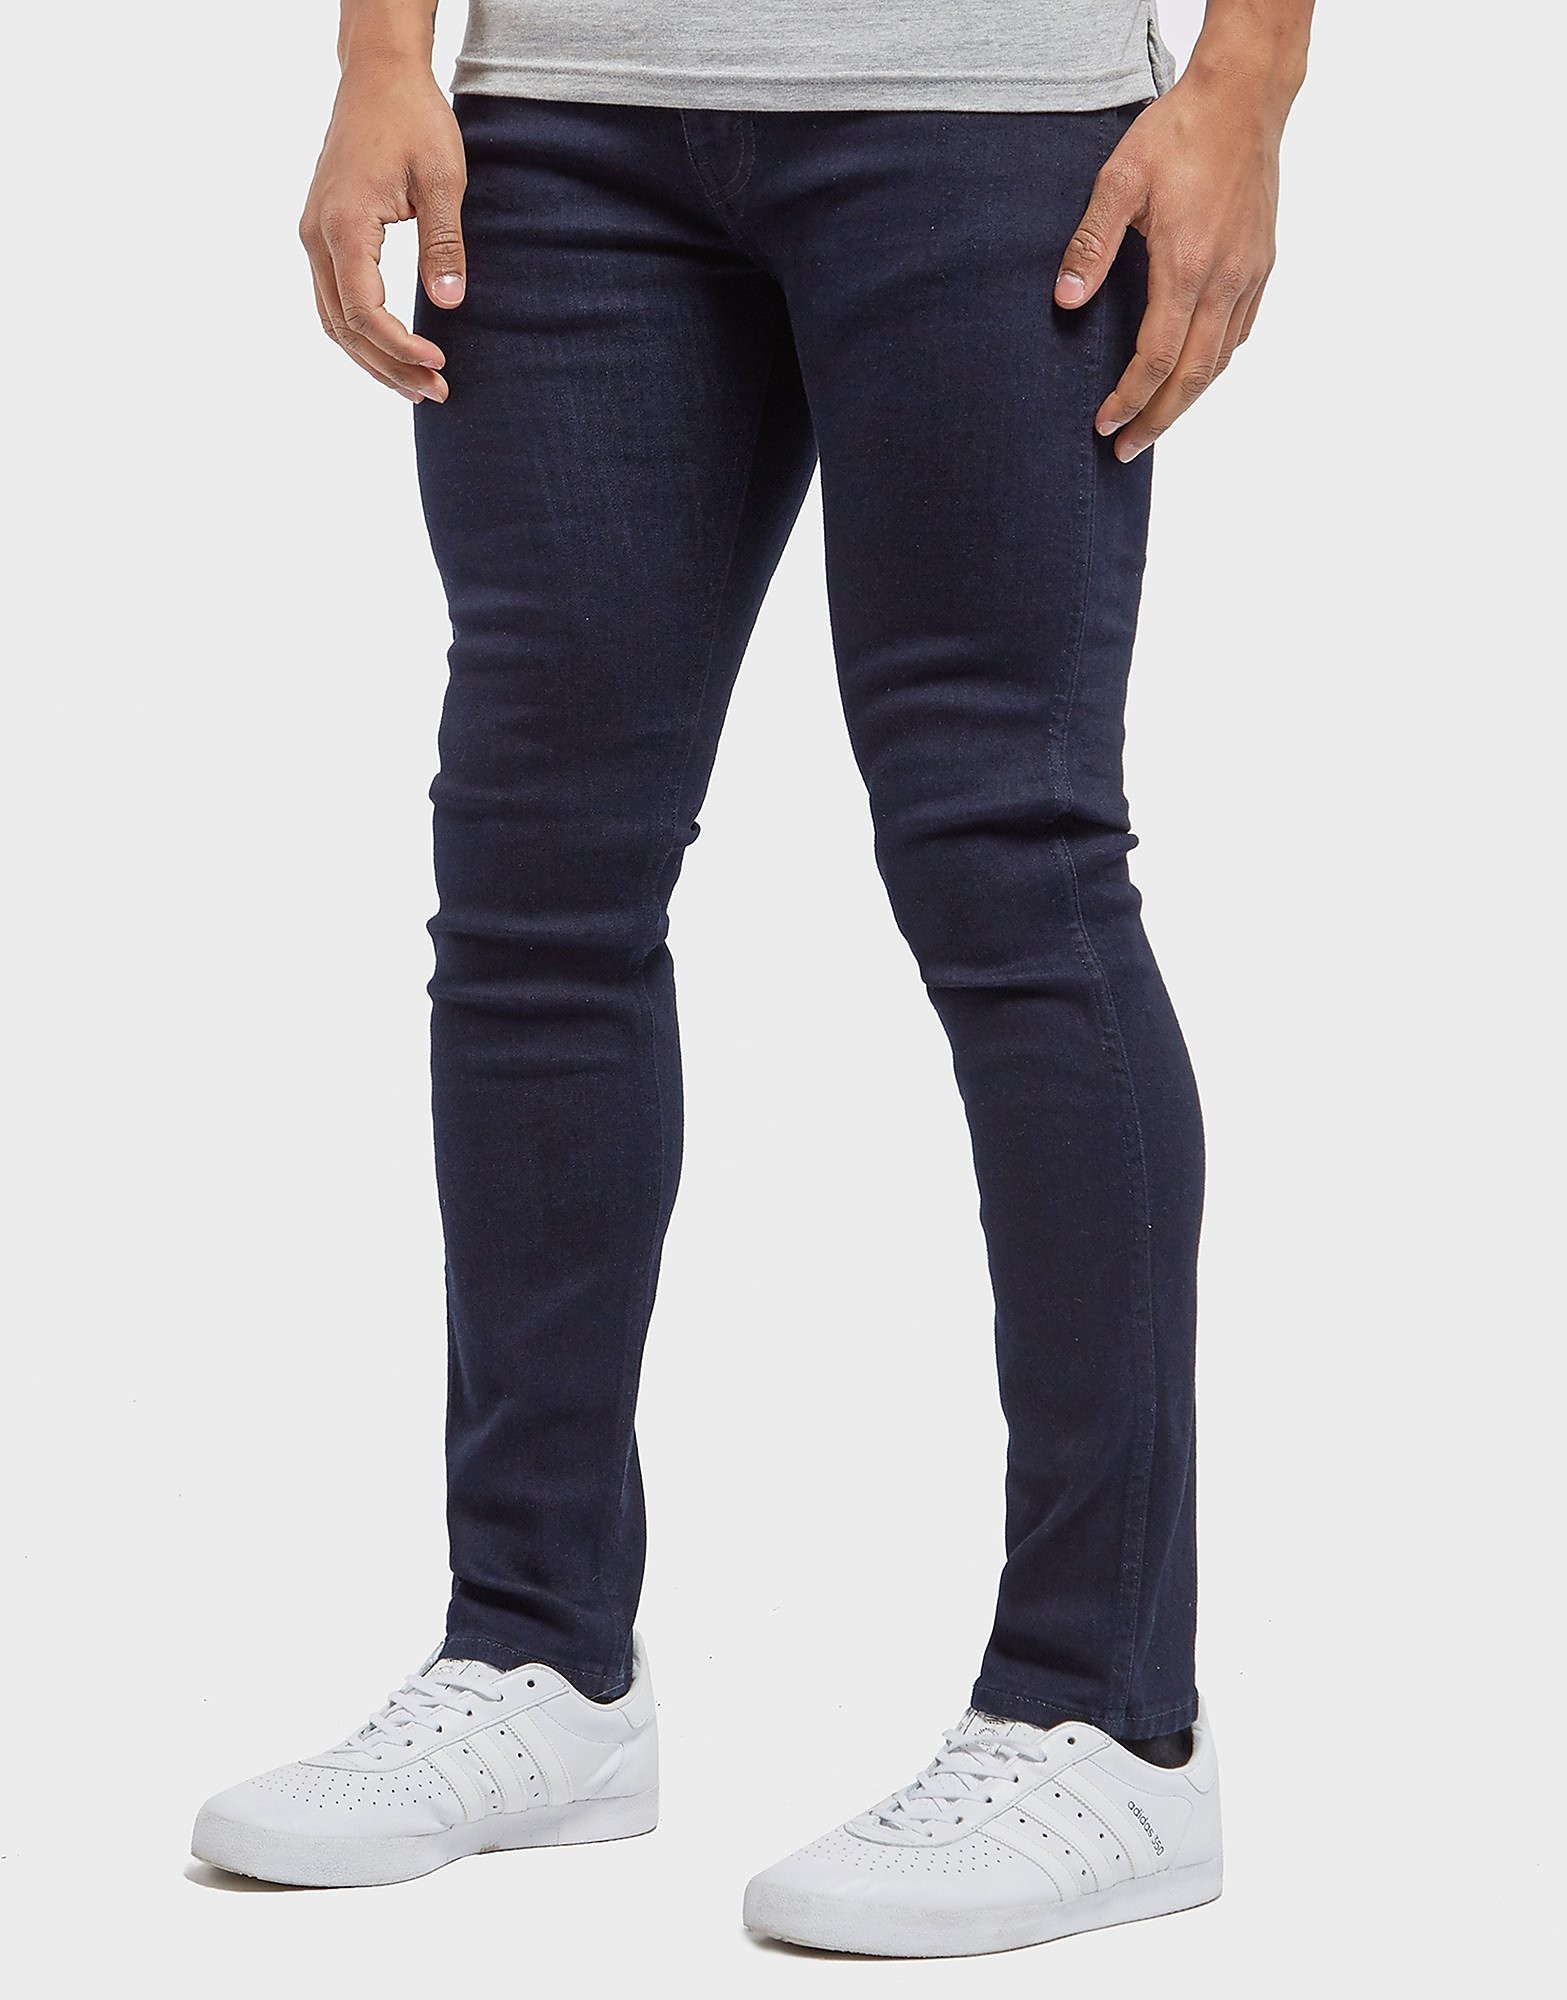 Levis Line 8 Skinny Jeans